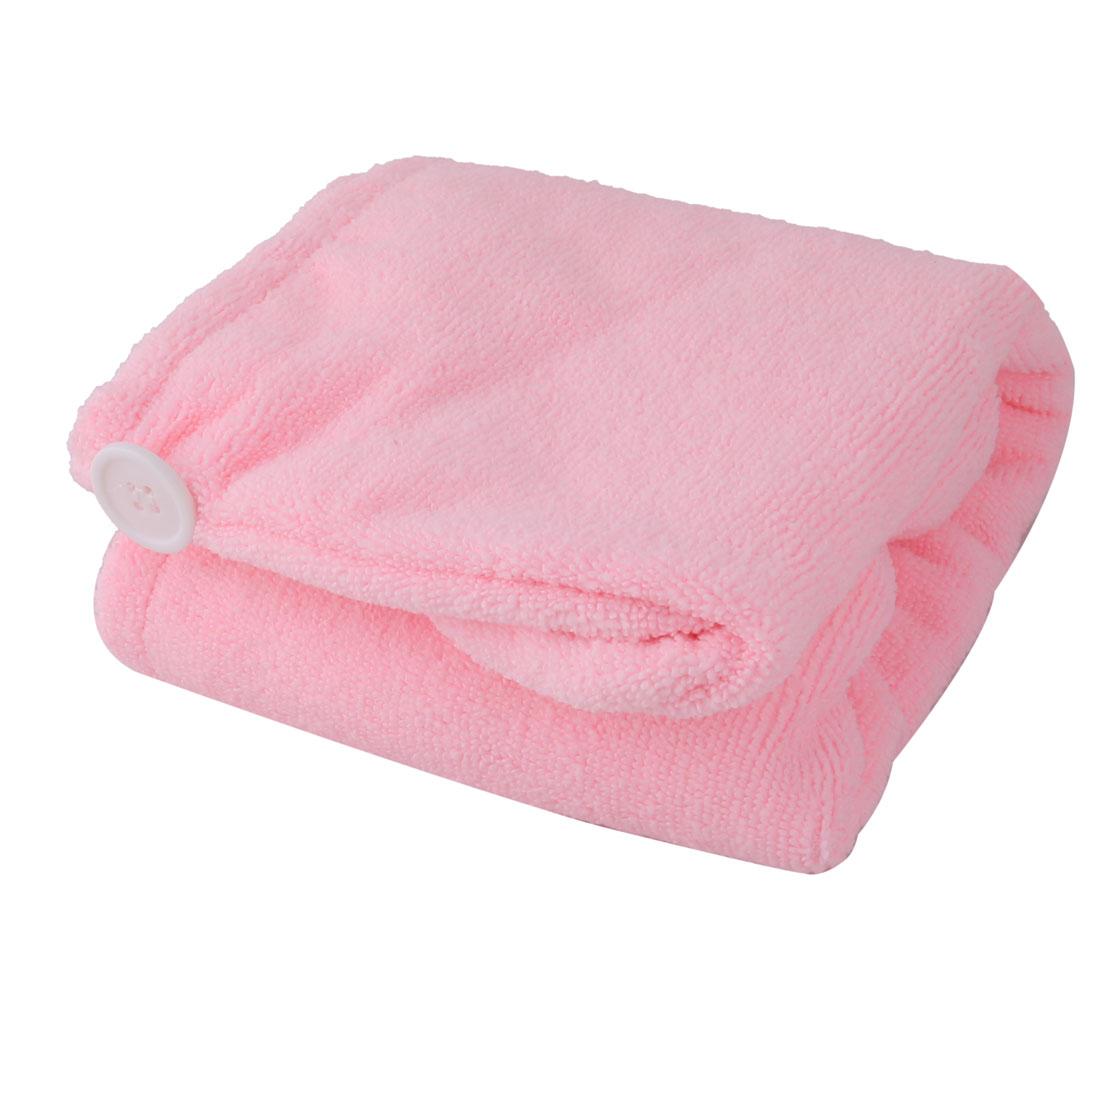 Bathroom Microfiber Stretchy Shower Bathing Hair Wrap Drying Cap Hat Towel Pink